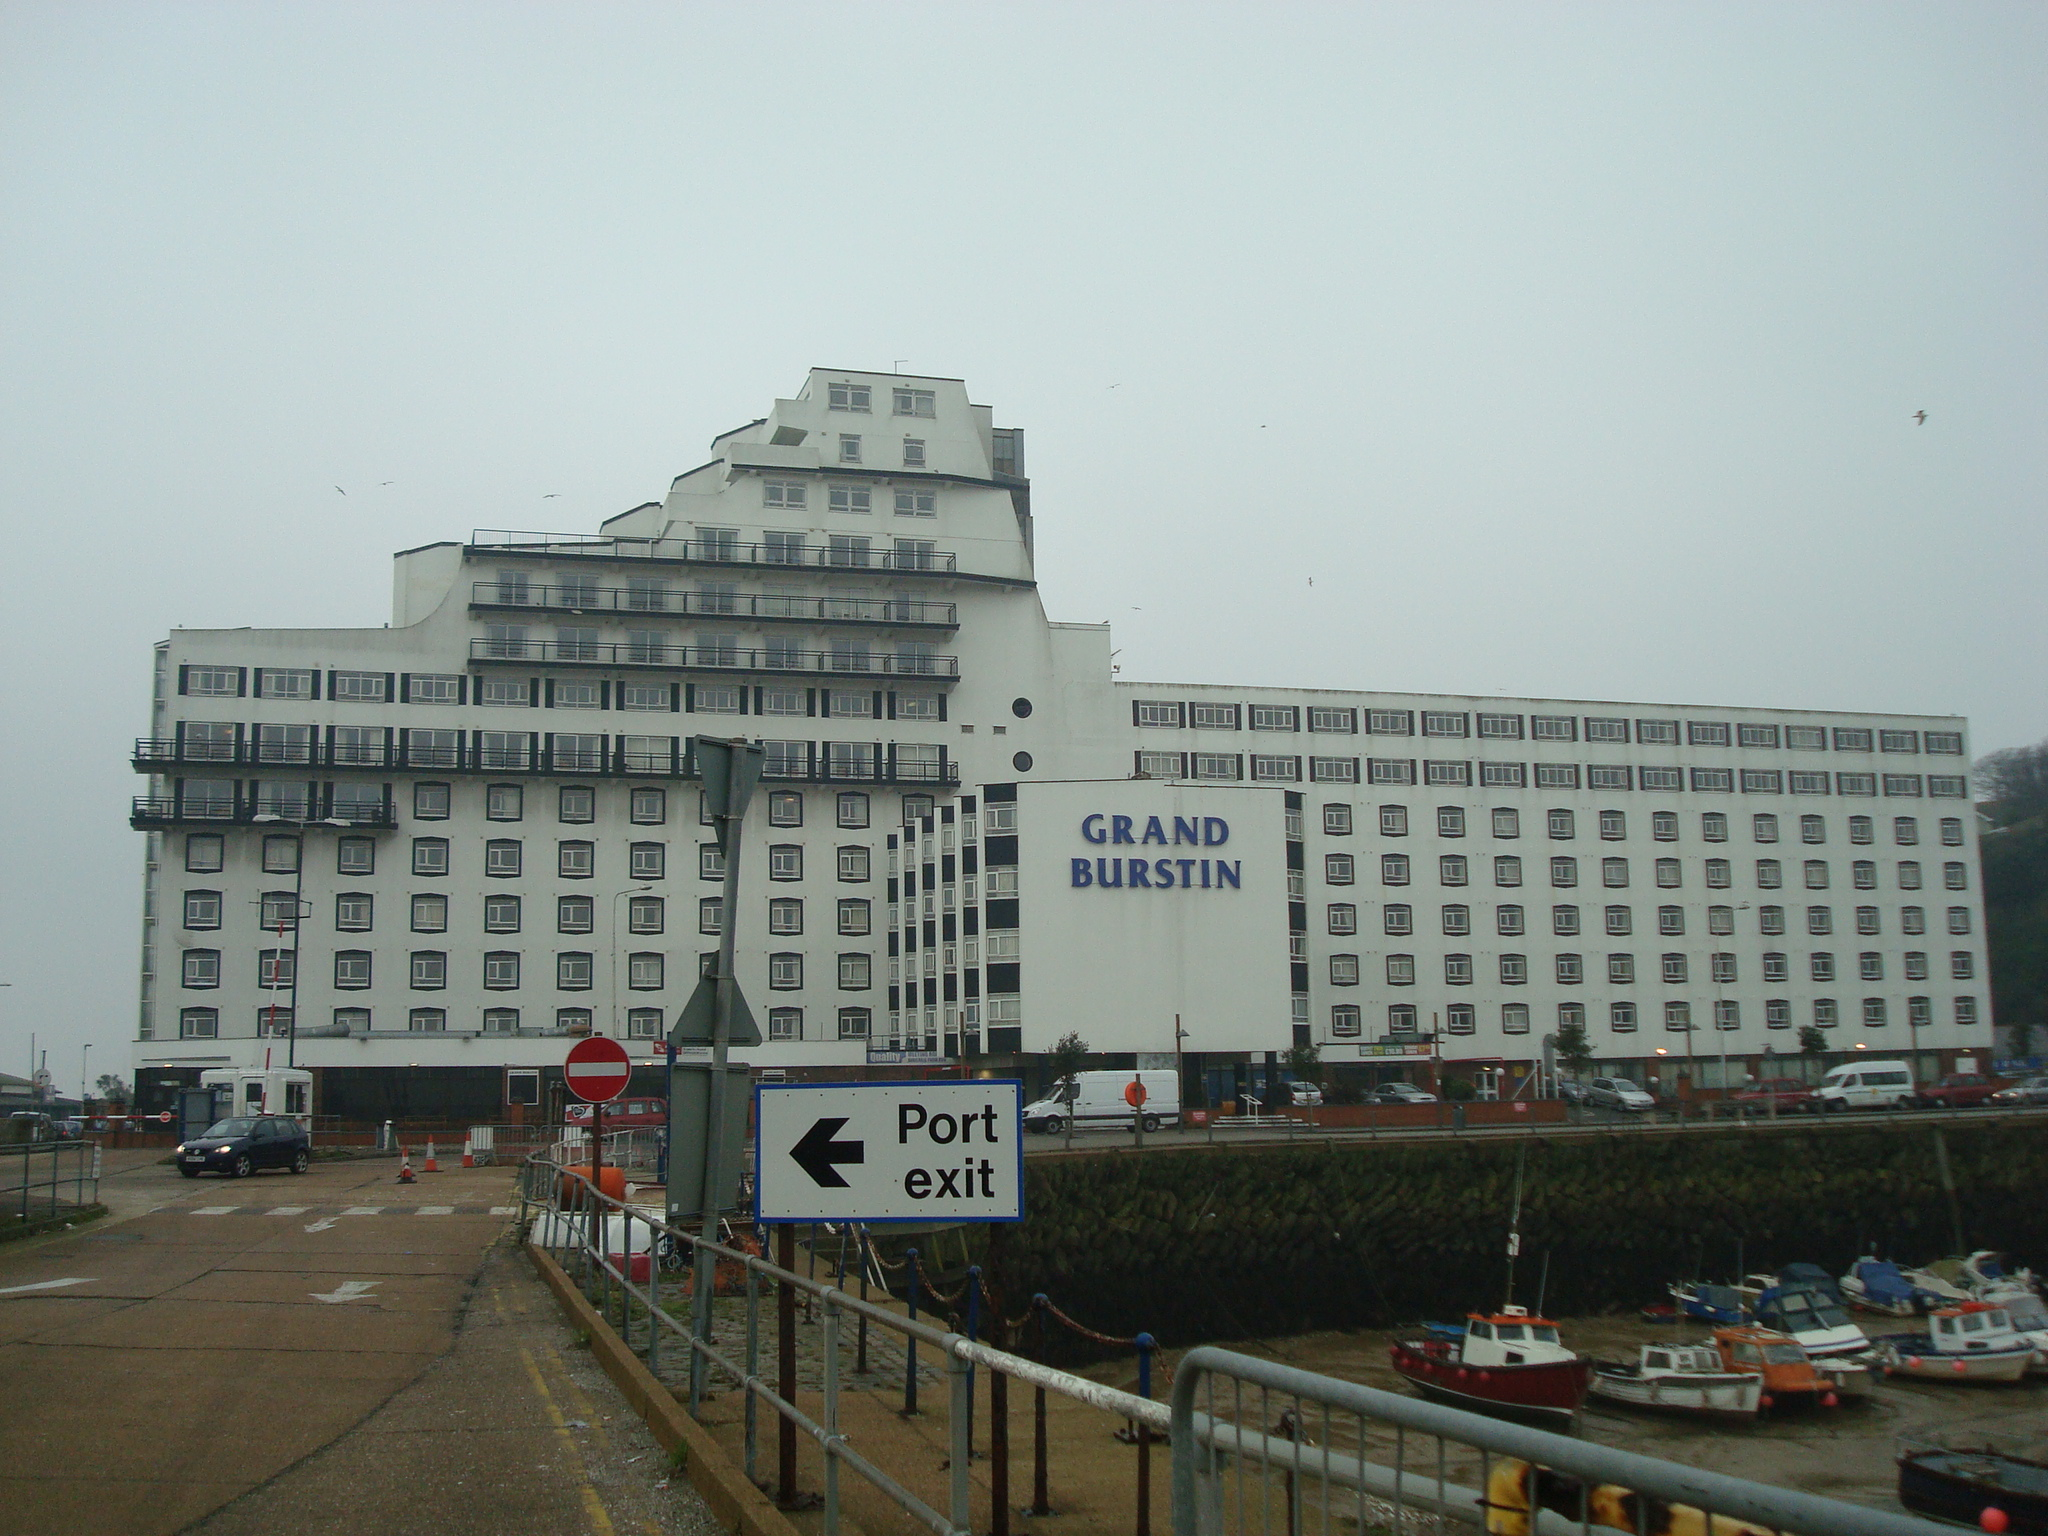 The_Grand_Burstin_Hotel,_Folkestone_-_geograph.org.uk_-_1718491